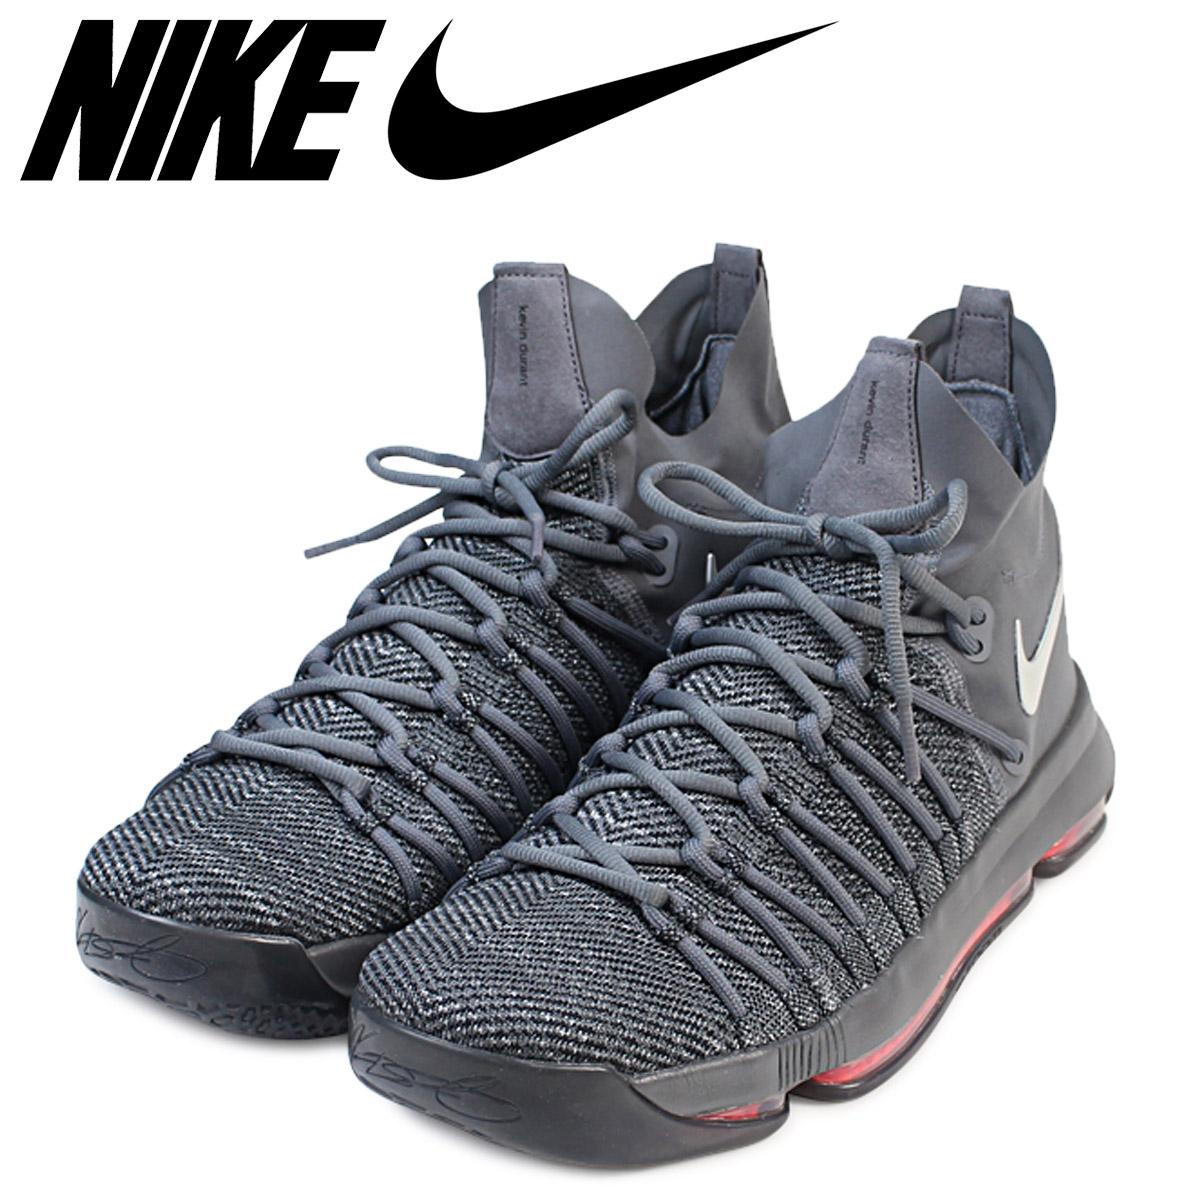 7ee683a0a555 ALLSPORTS  NIKE Nike KD9 sneakers ZOOM KD9 ELITE TS EP men 909